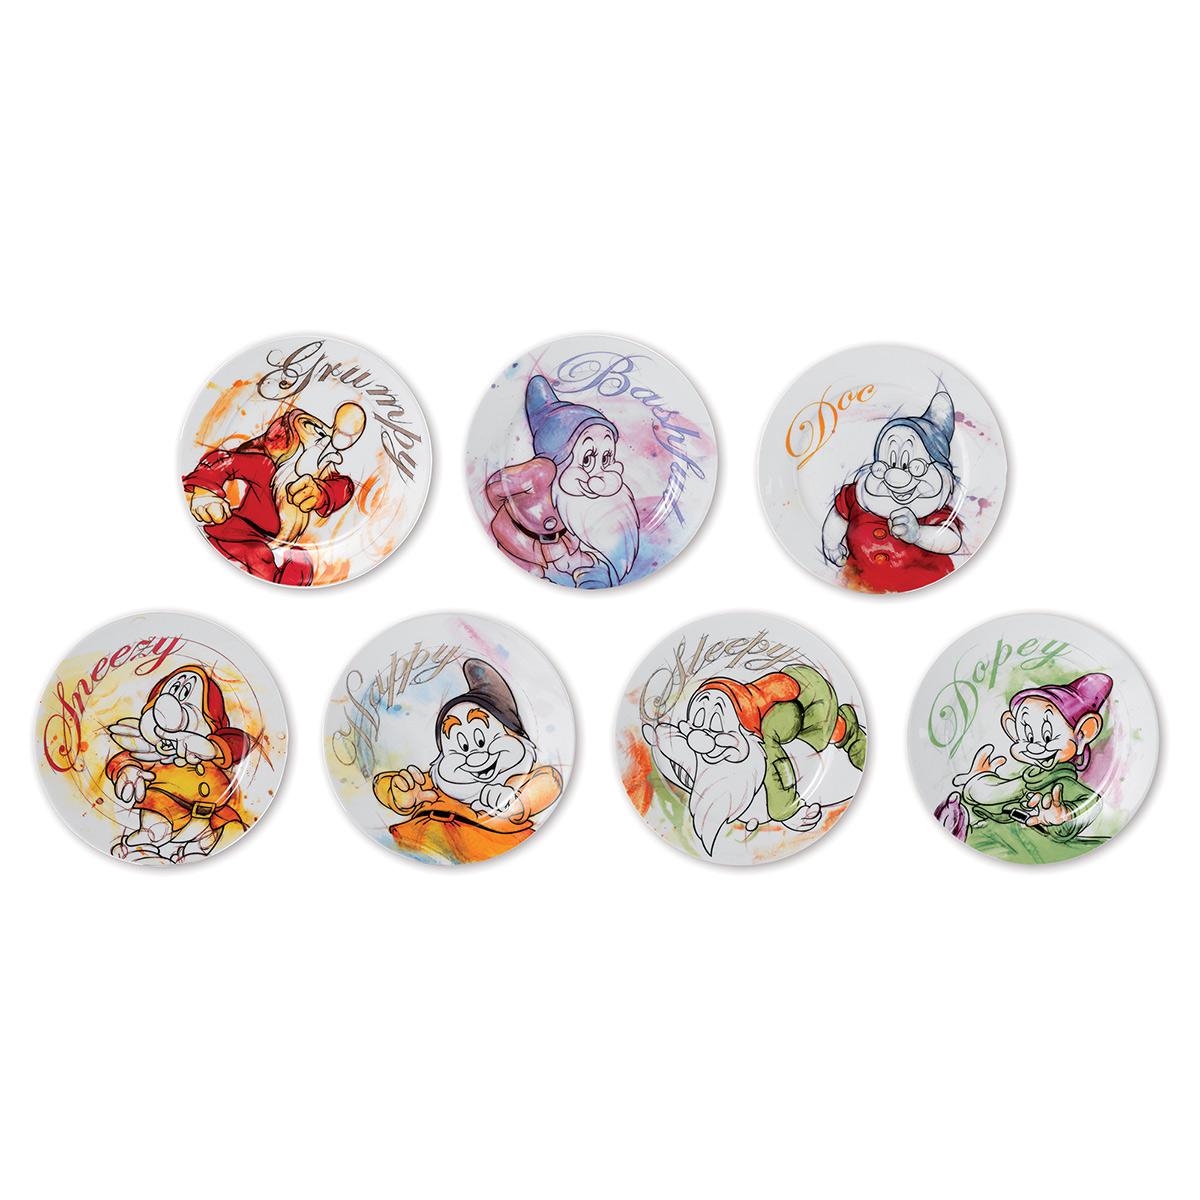 7 Dwarfs Set Plates Dessert - Disney Home